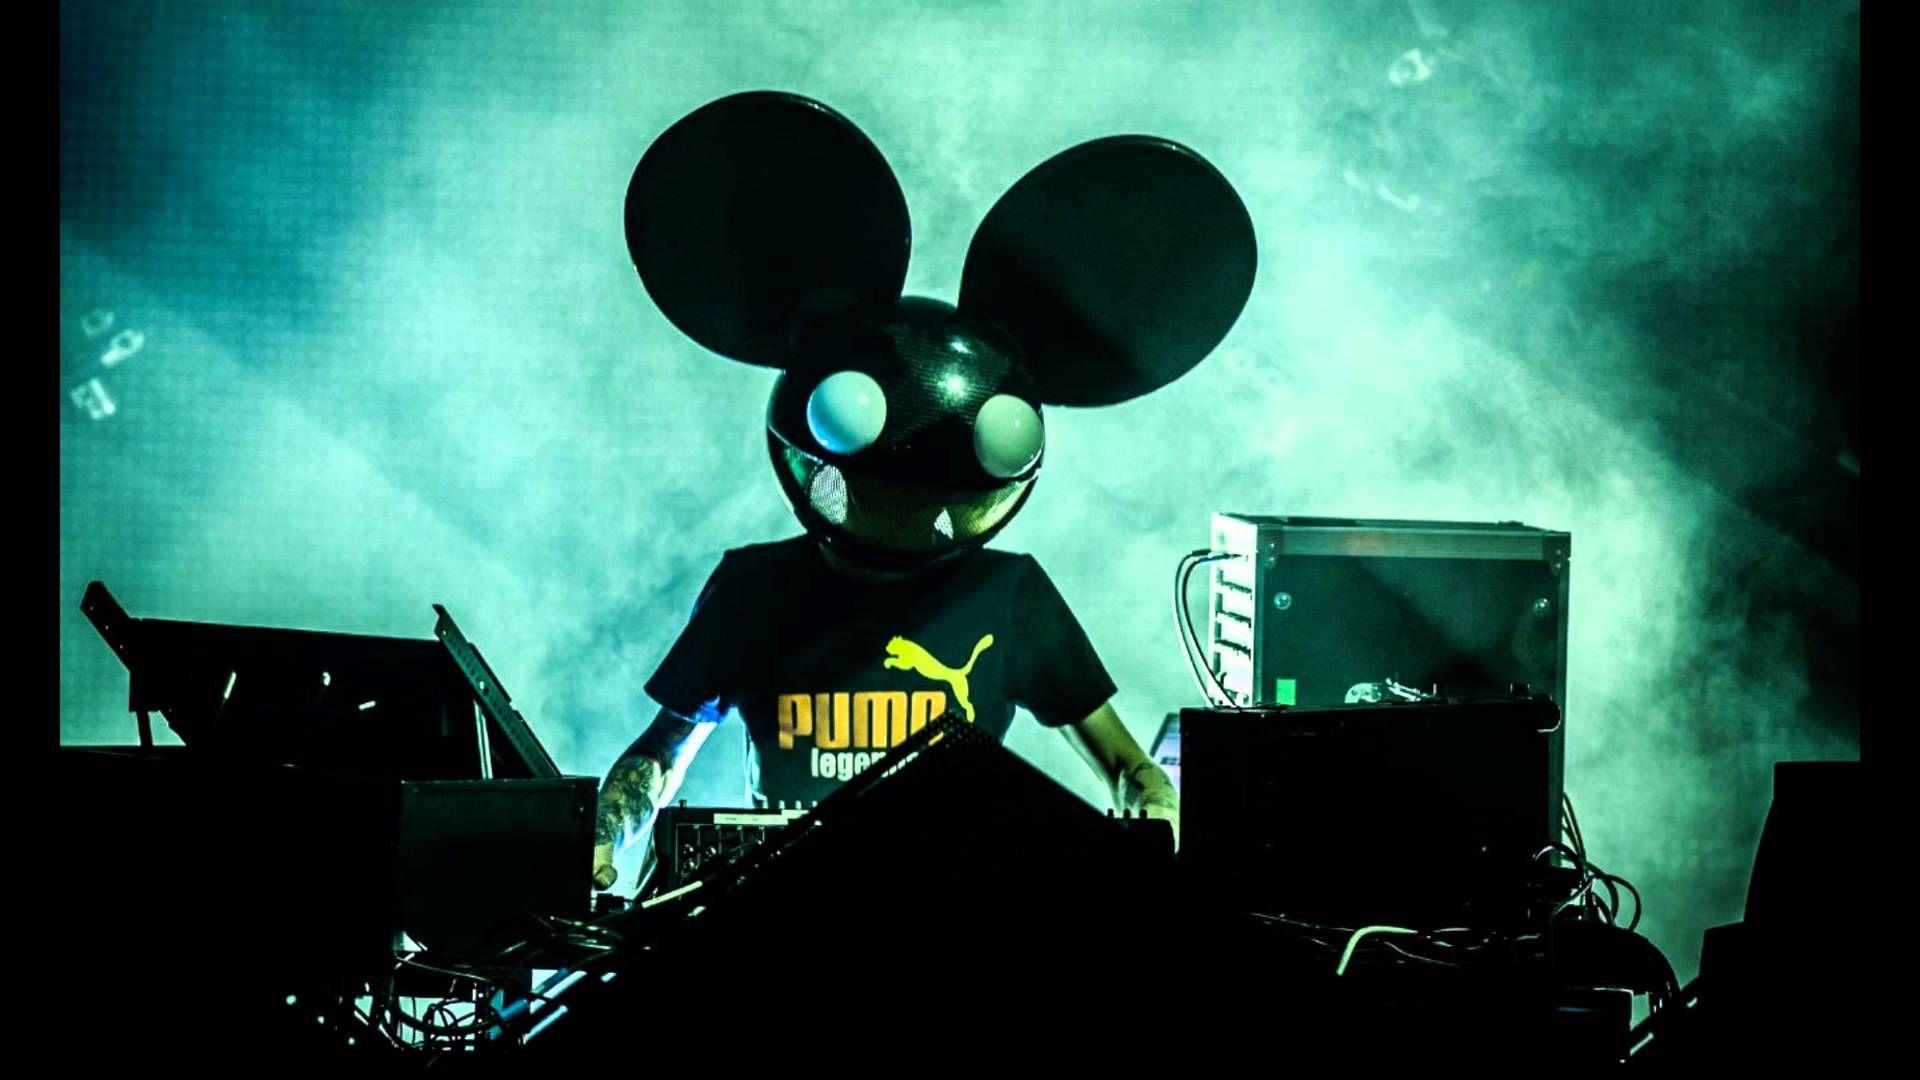 Deadmau15   Some Chords DLS Remix   Electronic dance music, News ...